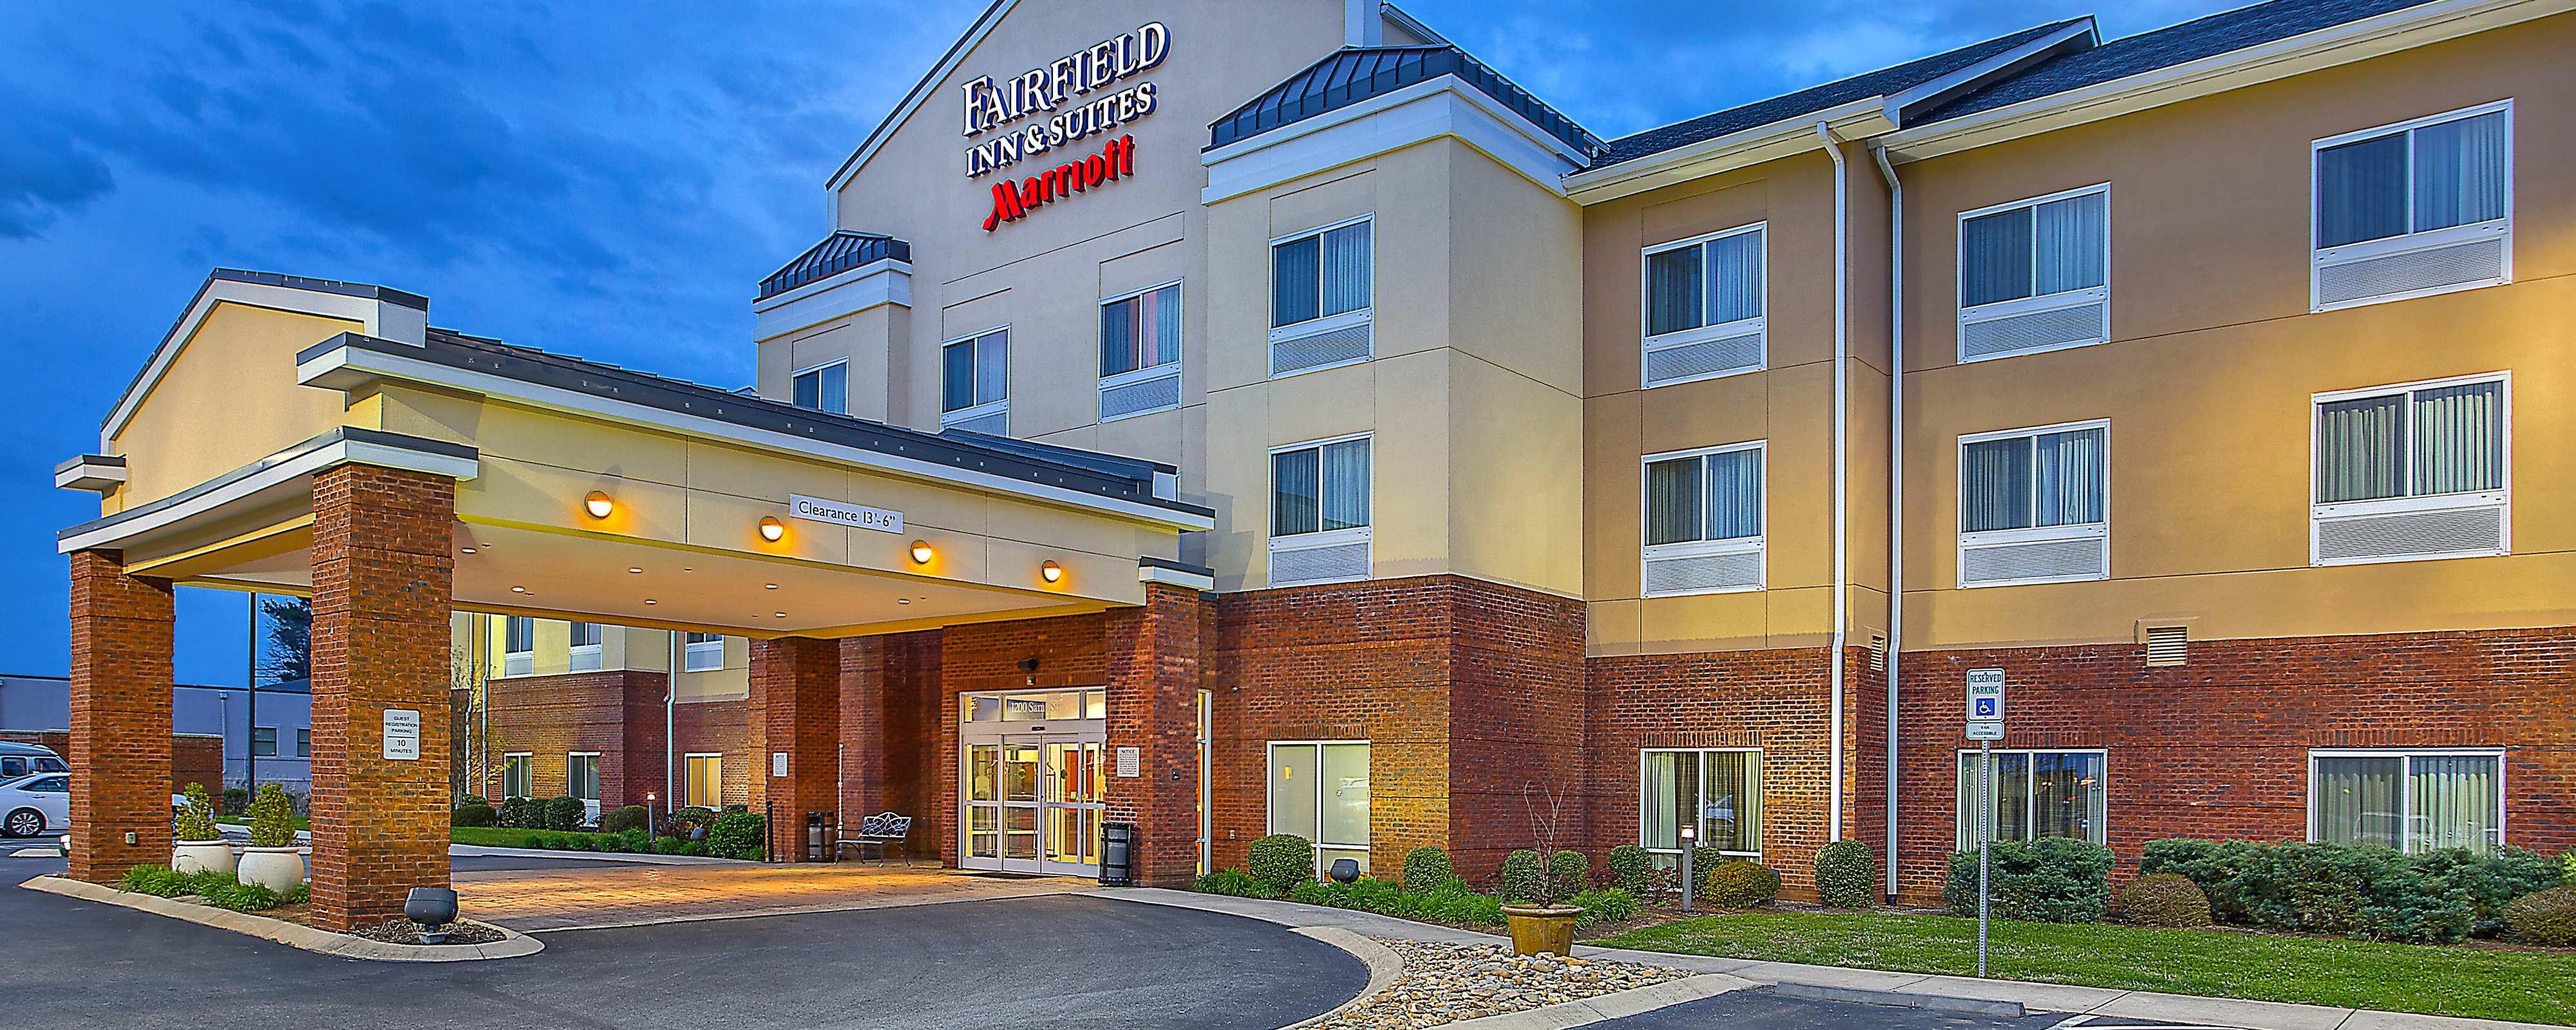 Hotels in Cookeville TN near Baxter  Fairfield Inn